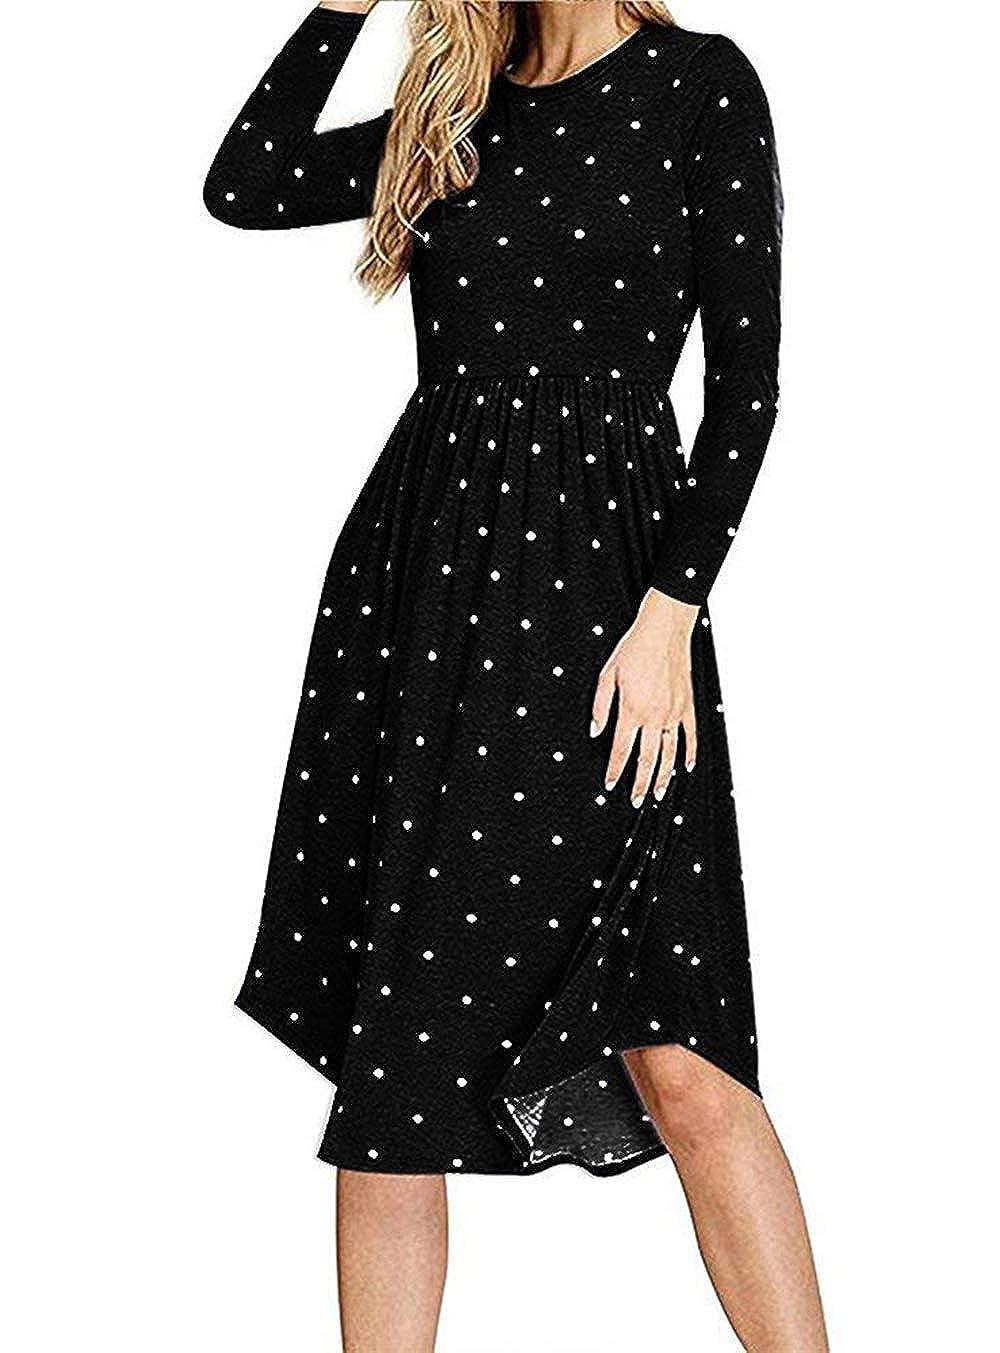 Black AMCLOS Women Pleated Polka Dot Dress with Pocket Swing Casual U Neck Midi Dress Long Sleeve